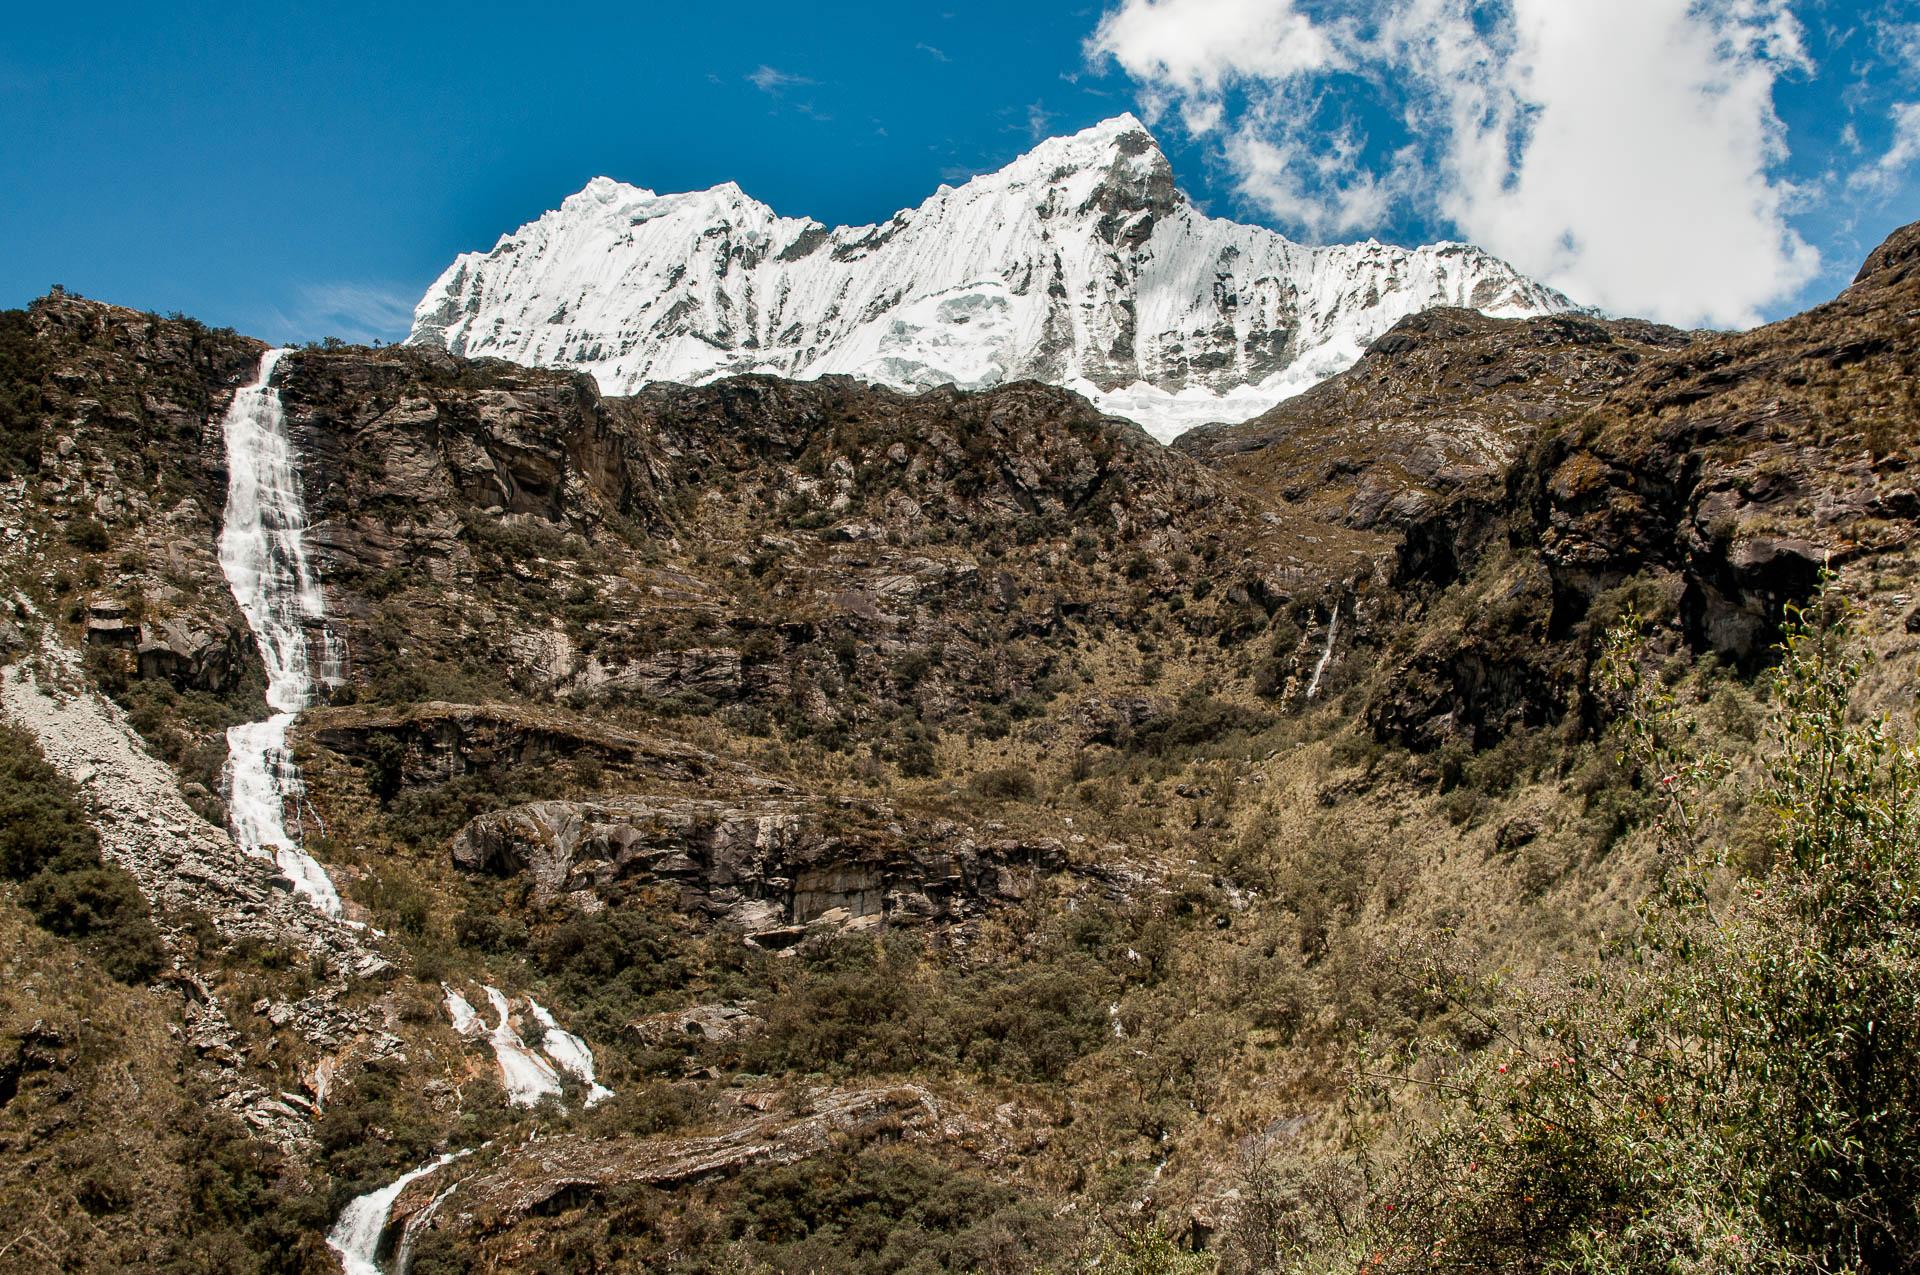 huaraz laguna 69 cascade vue - Les globe blogueurs - blog voyage nature